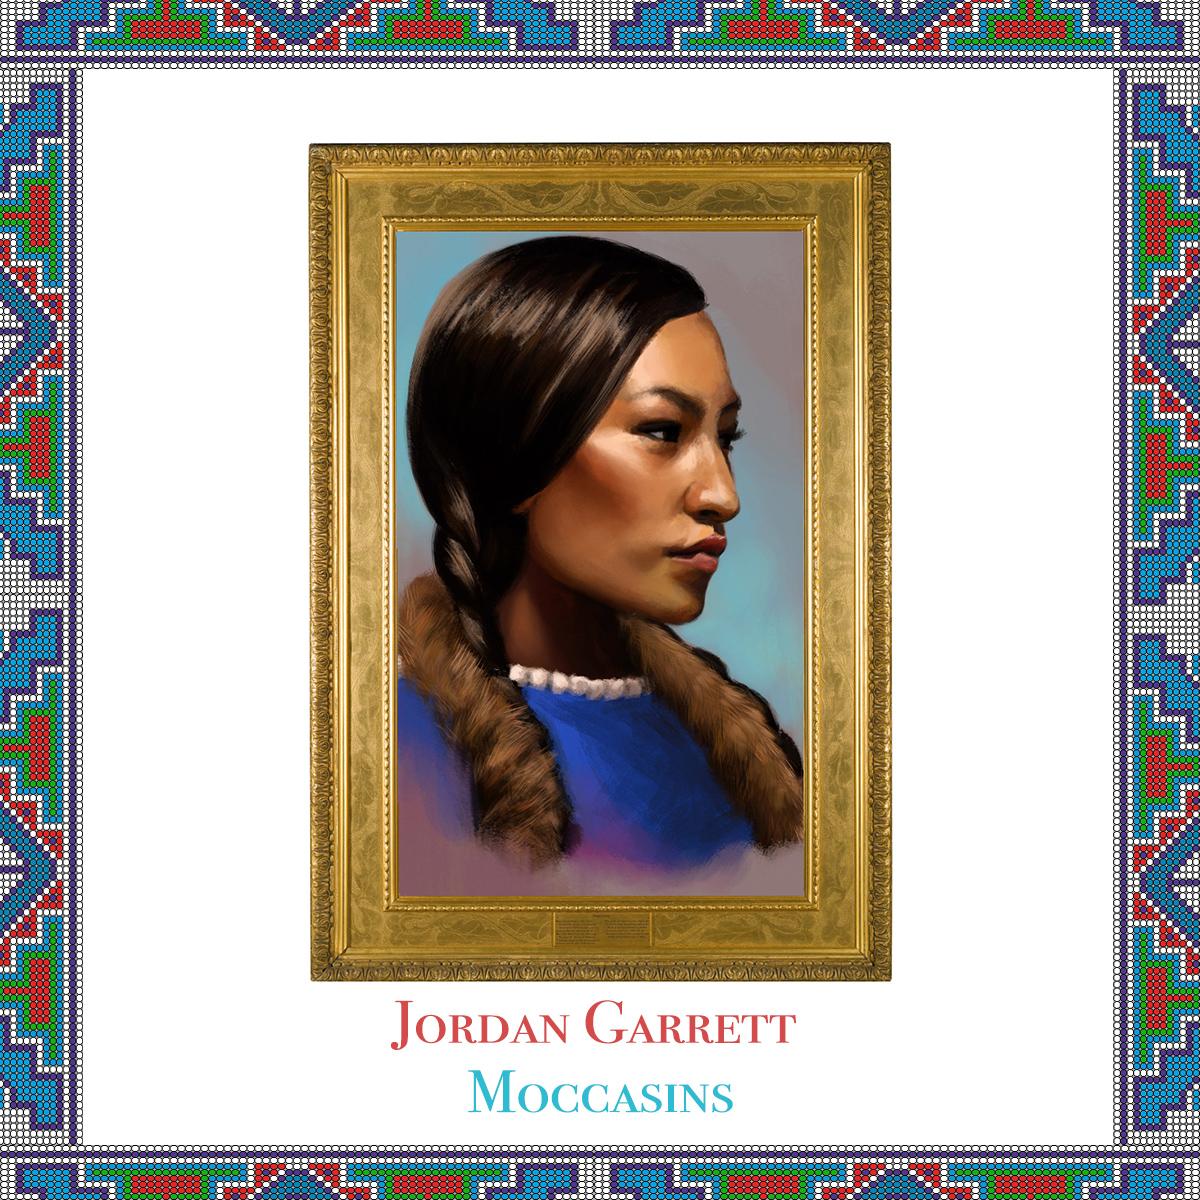 Moccasins by Jordan Garrett